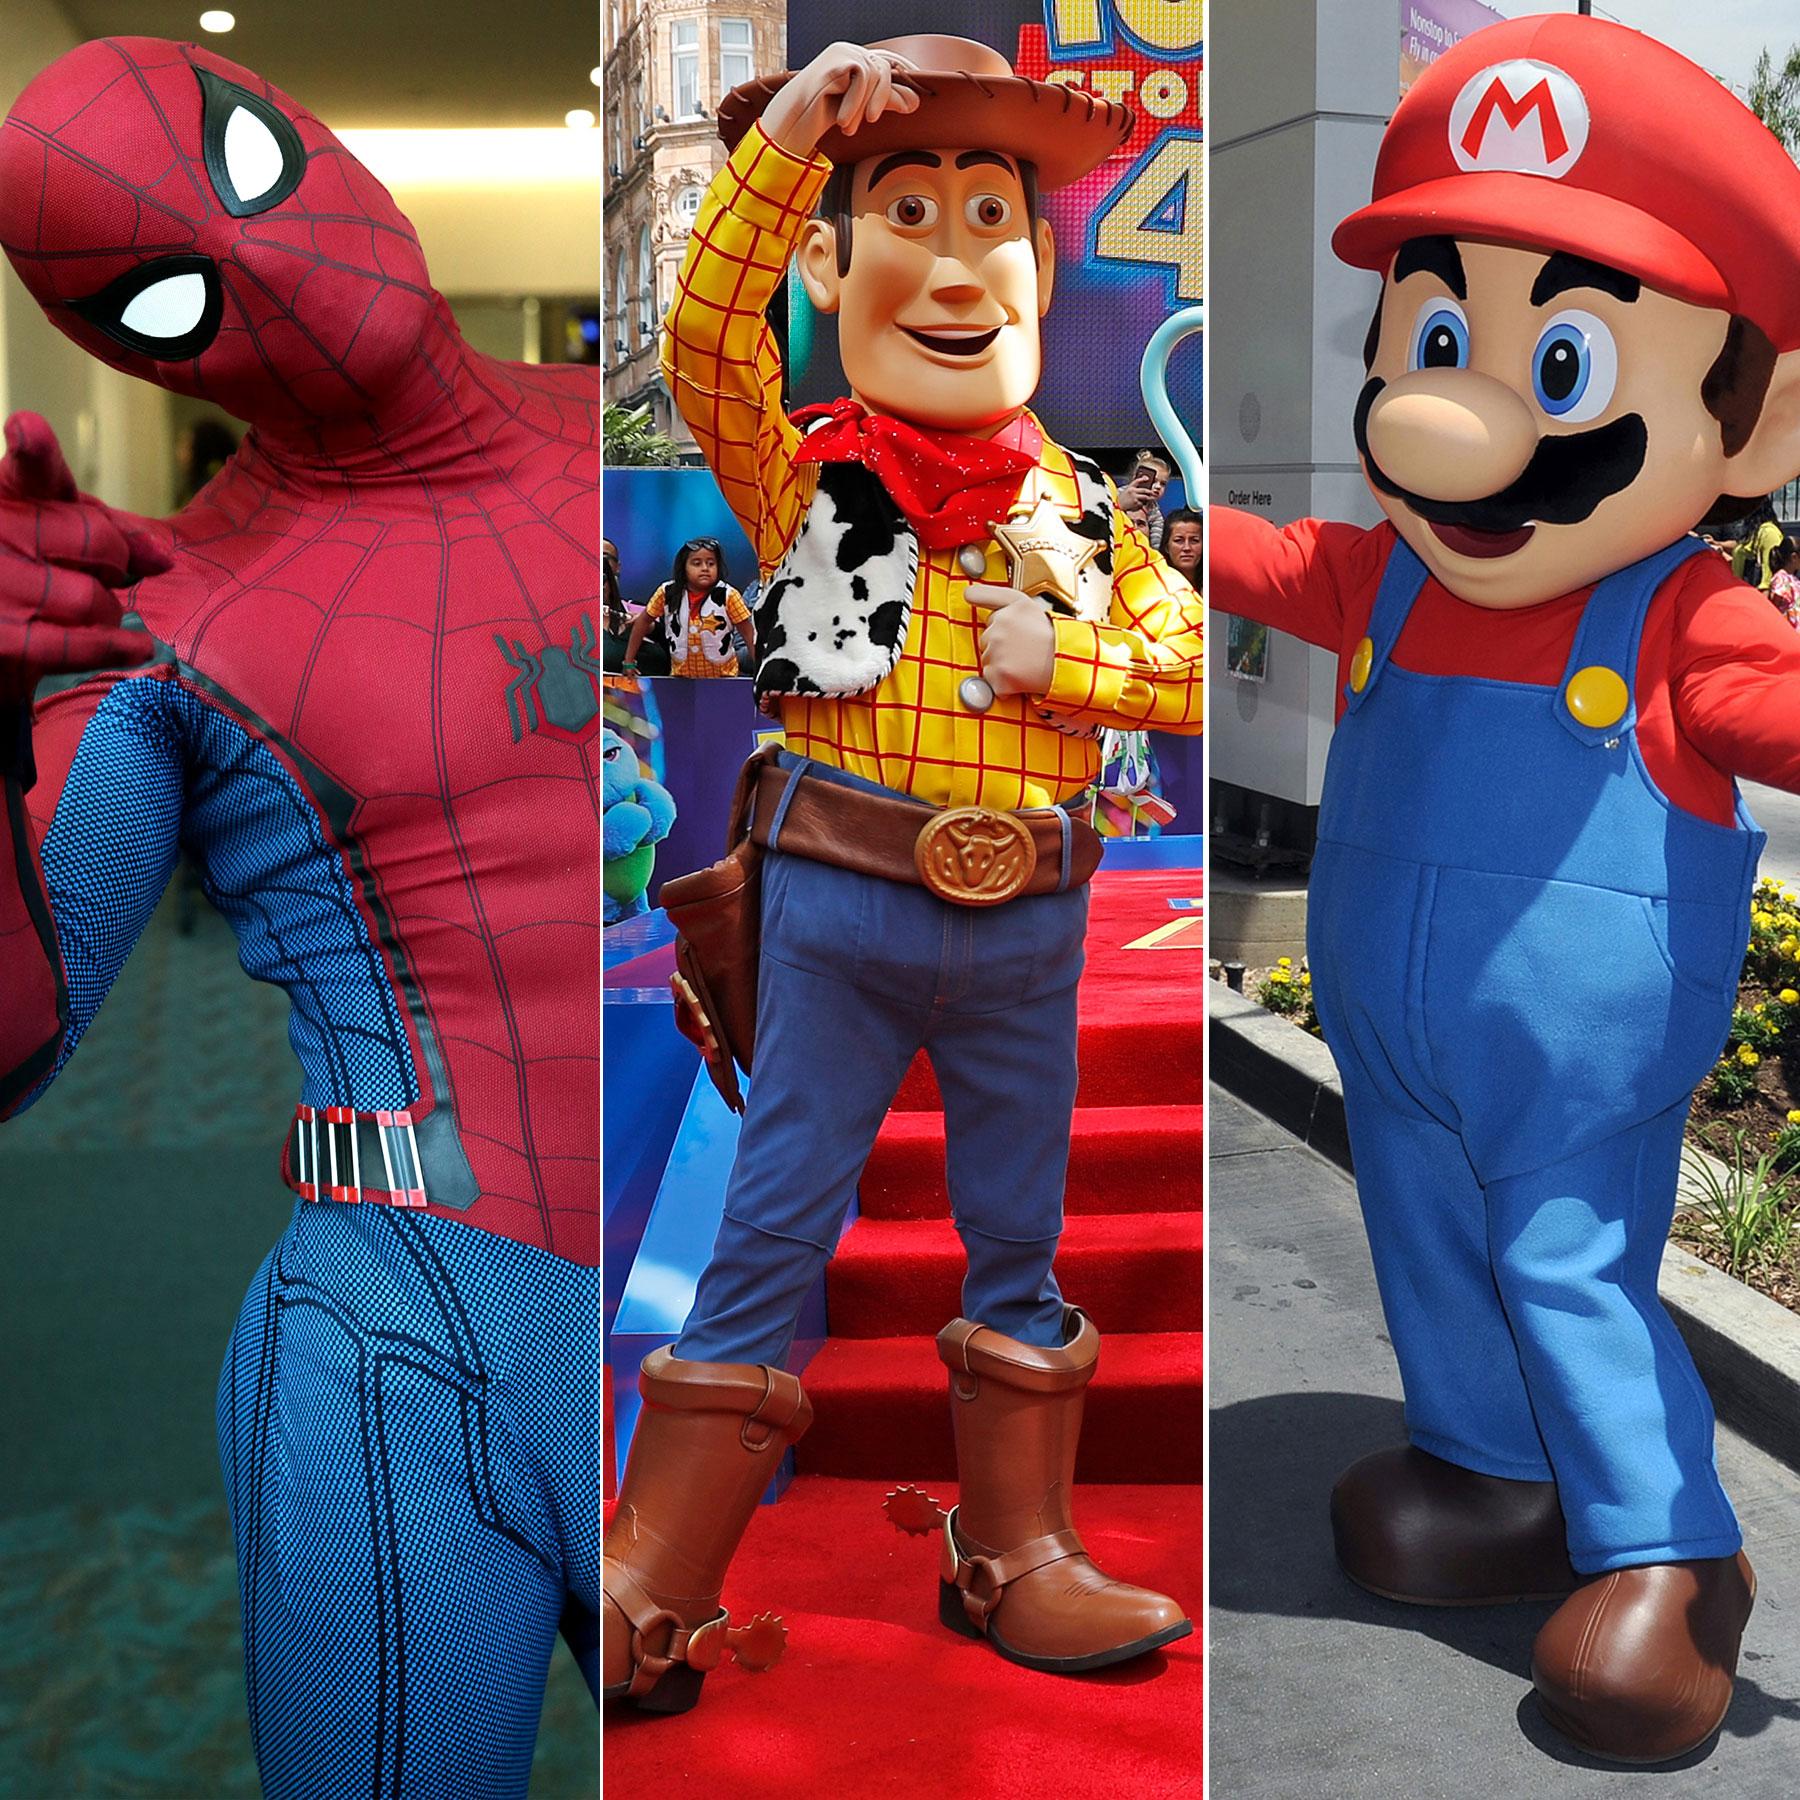 spiderman, toy story, mario bros, halloween